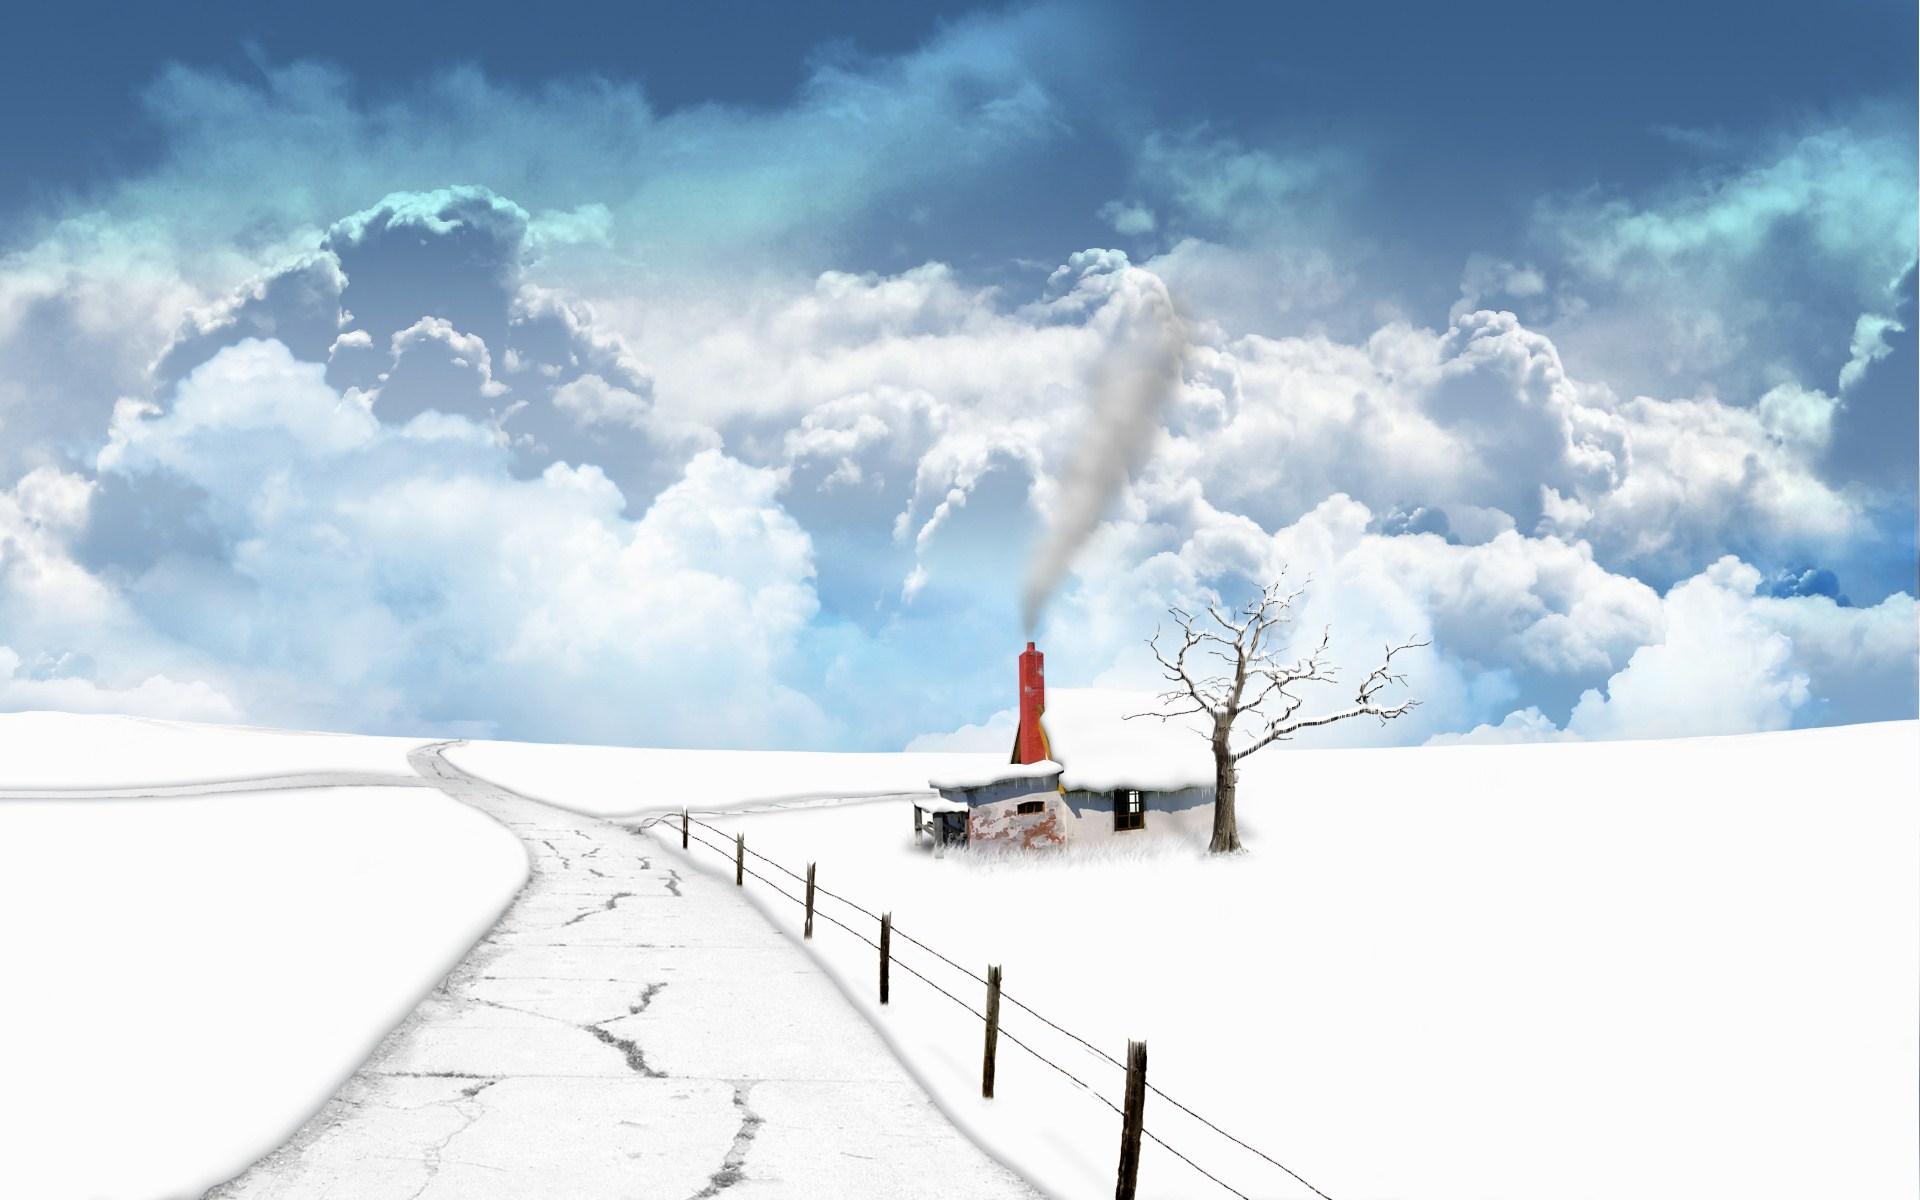 Fantasy - Landscape  Frozen White Snow Winter Wallpaper